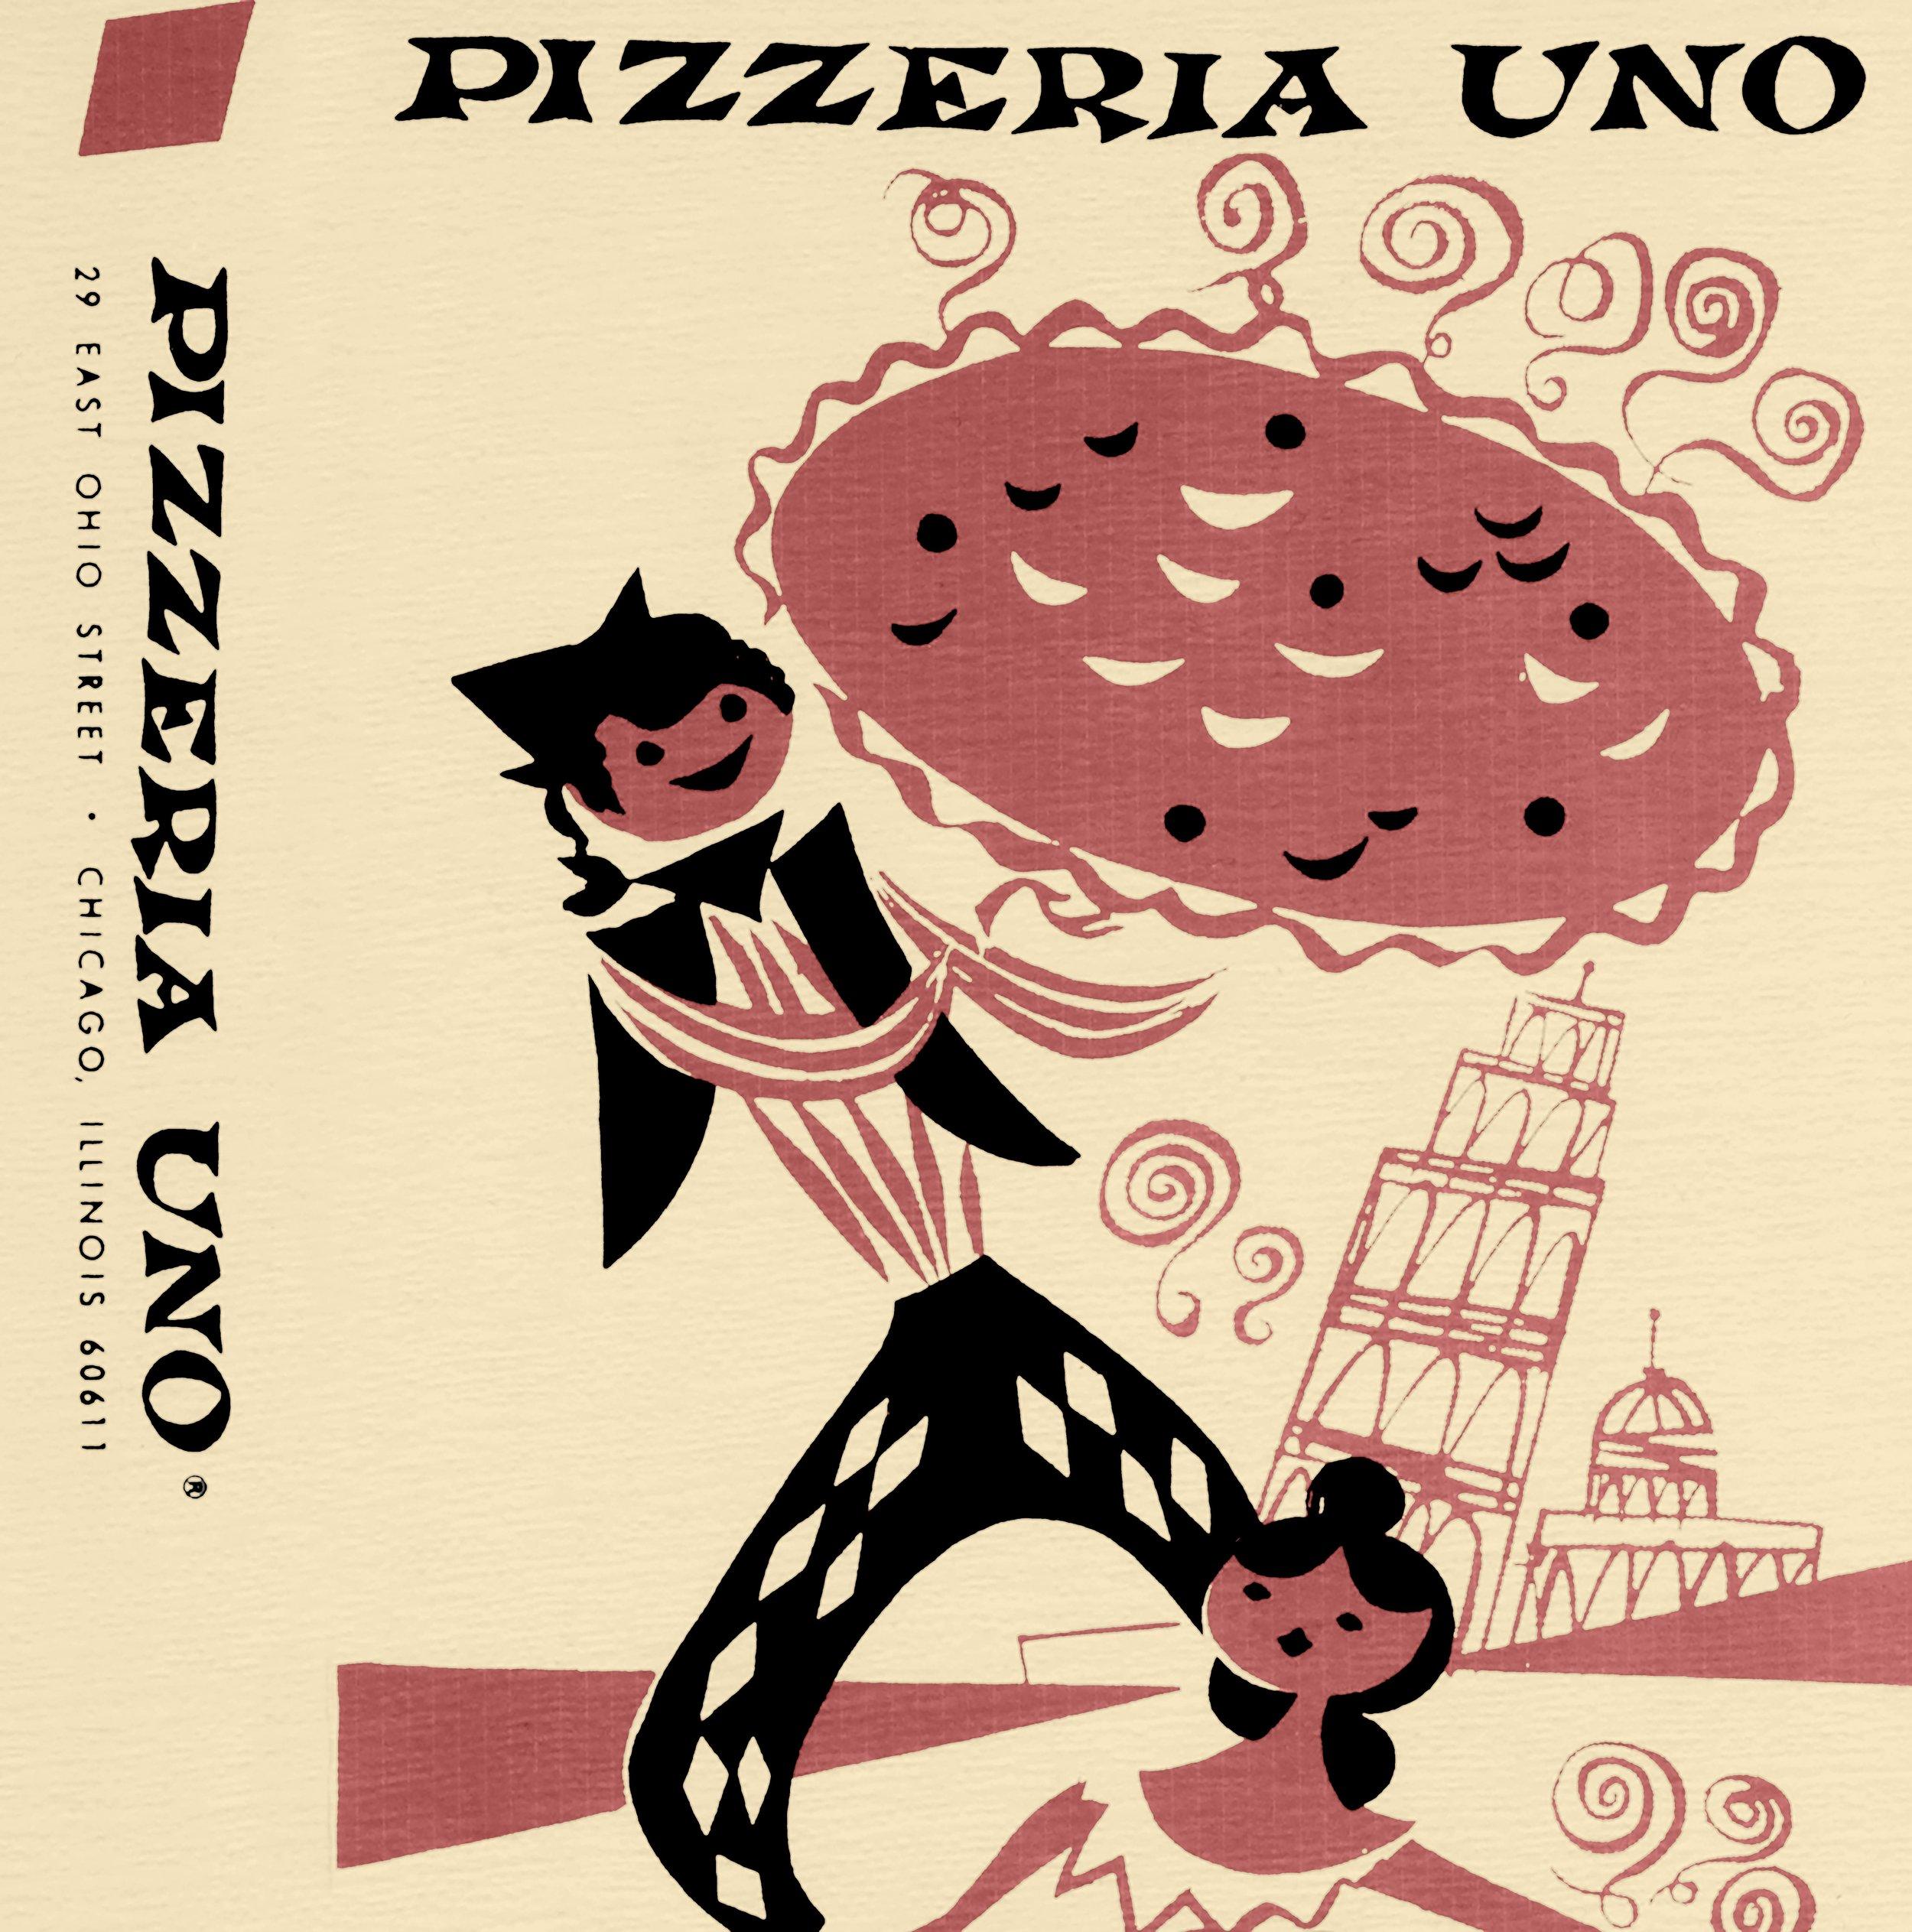 Menu 2 pizzeria uno bw for print.jpg